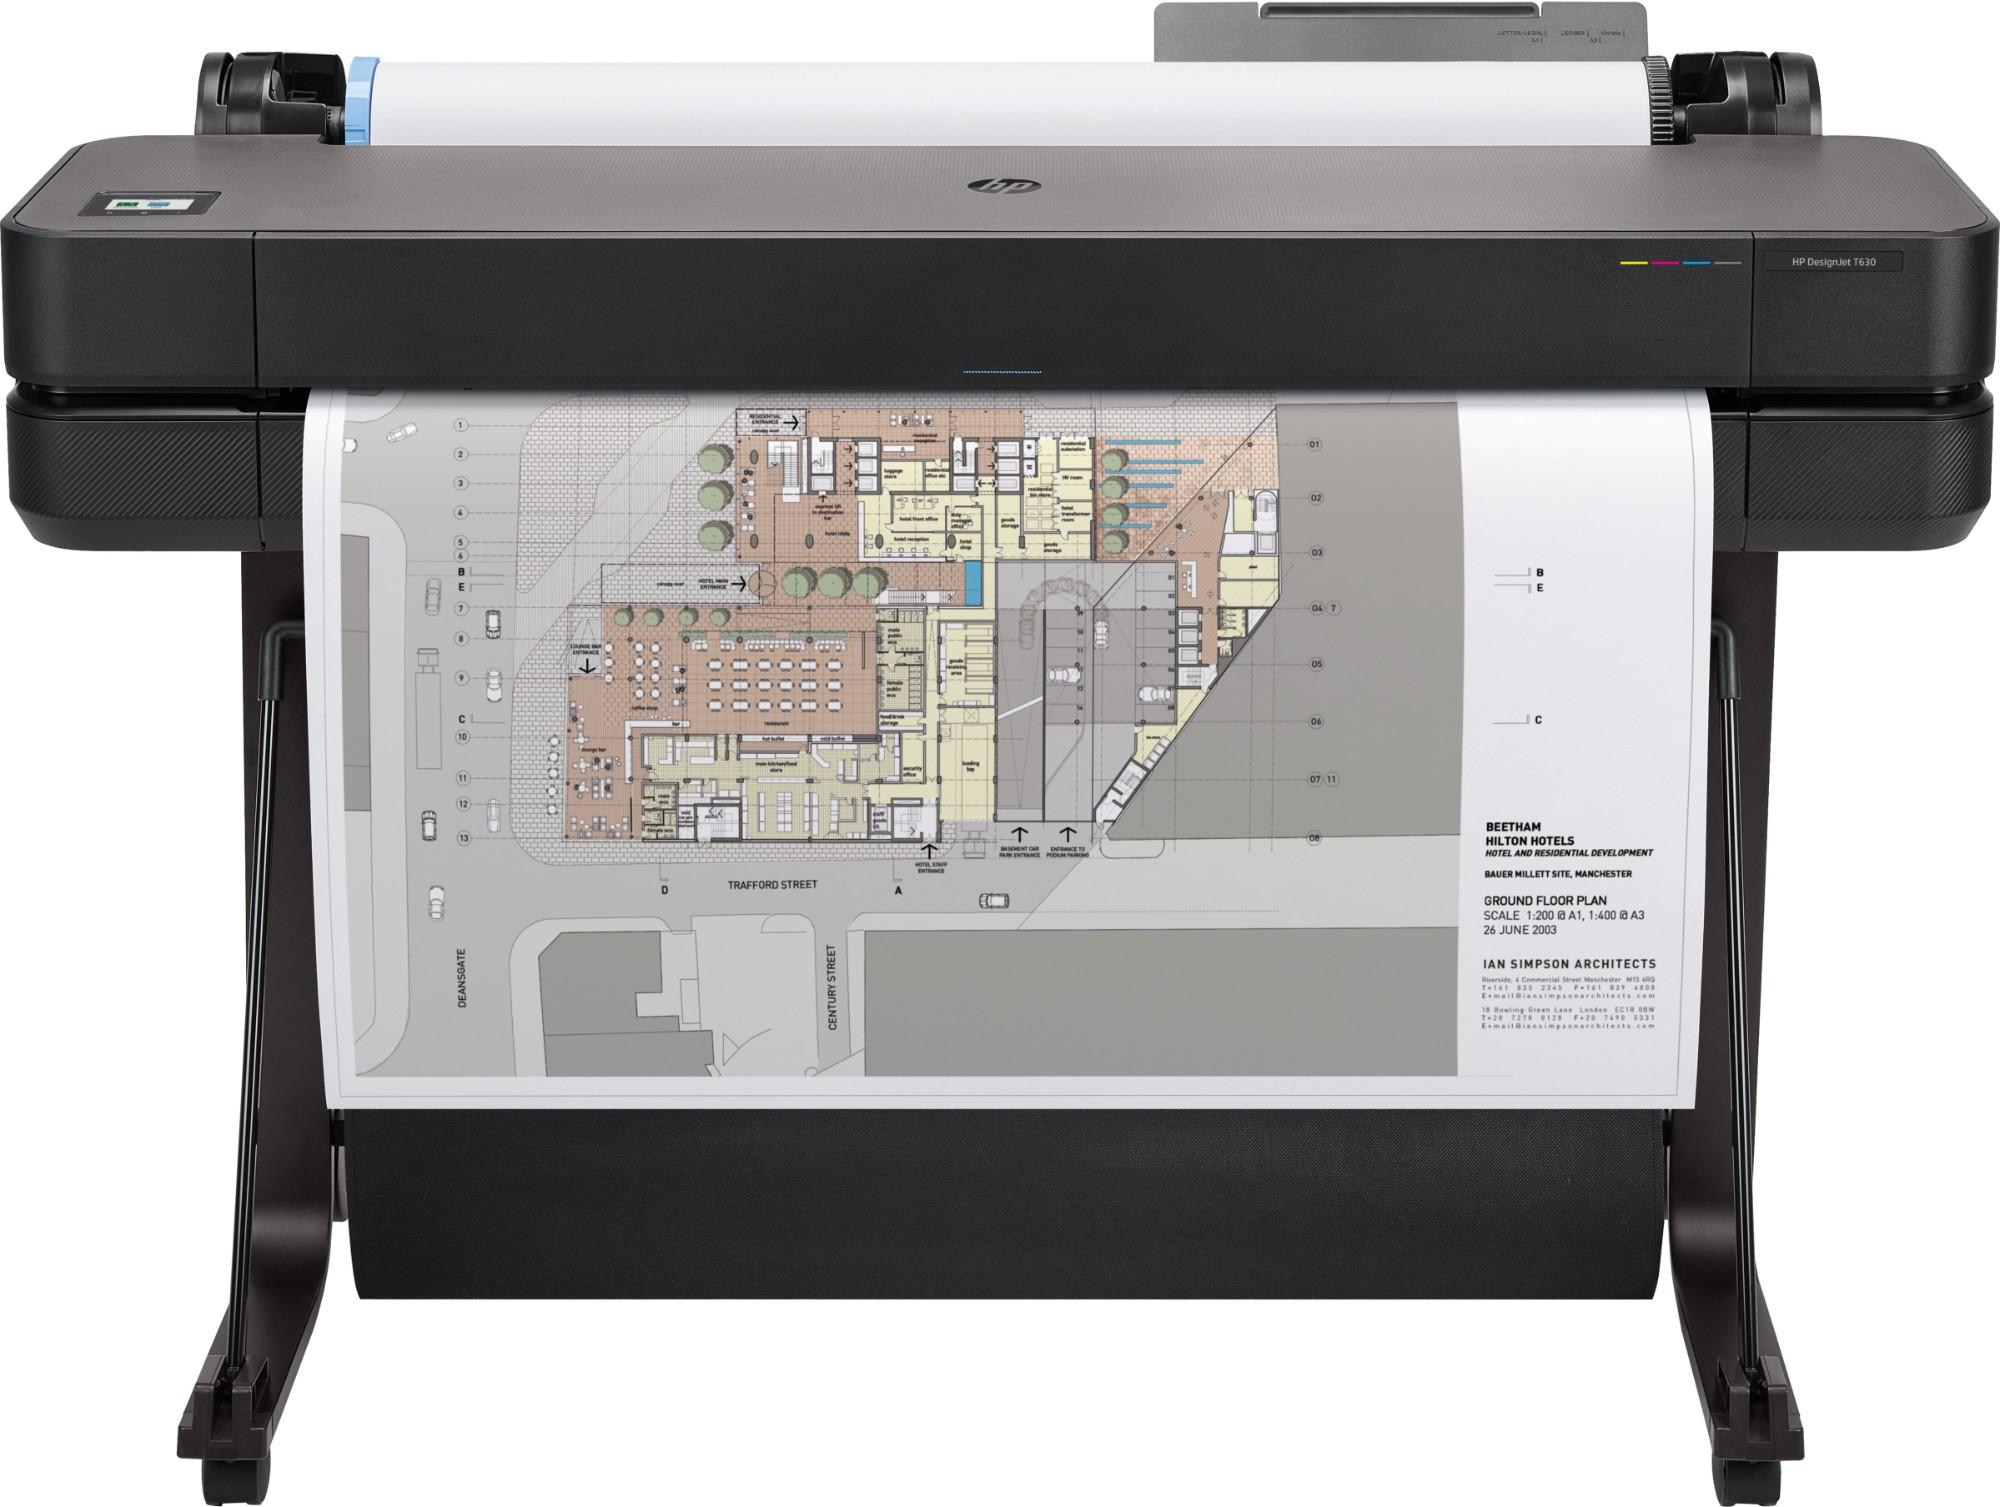 HP Designjet T630 large format printer Thermal inkjet Colour 2400 x 1200 DPI 914 x 1897 mm